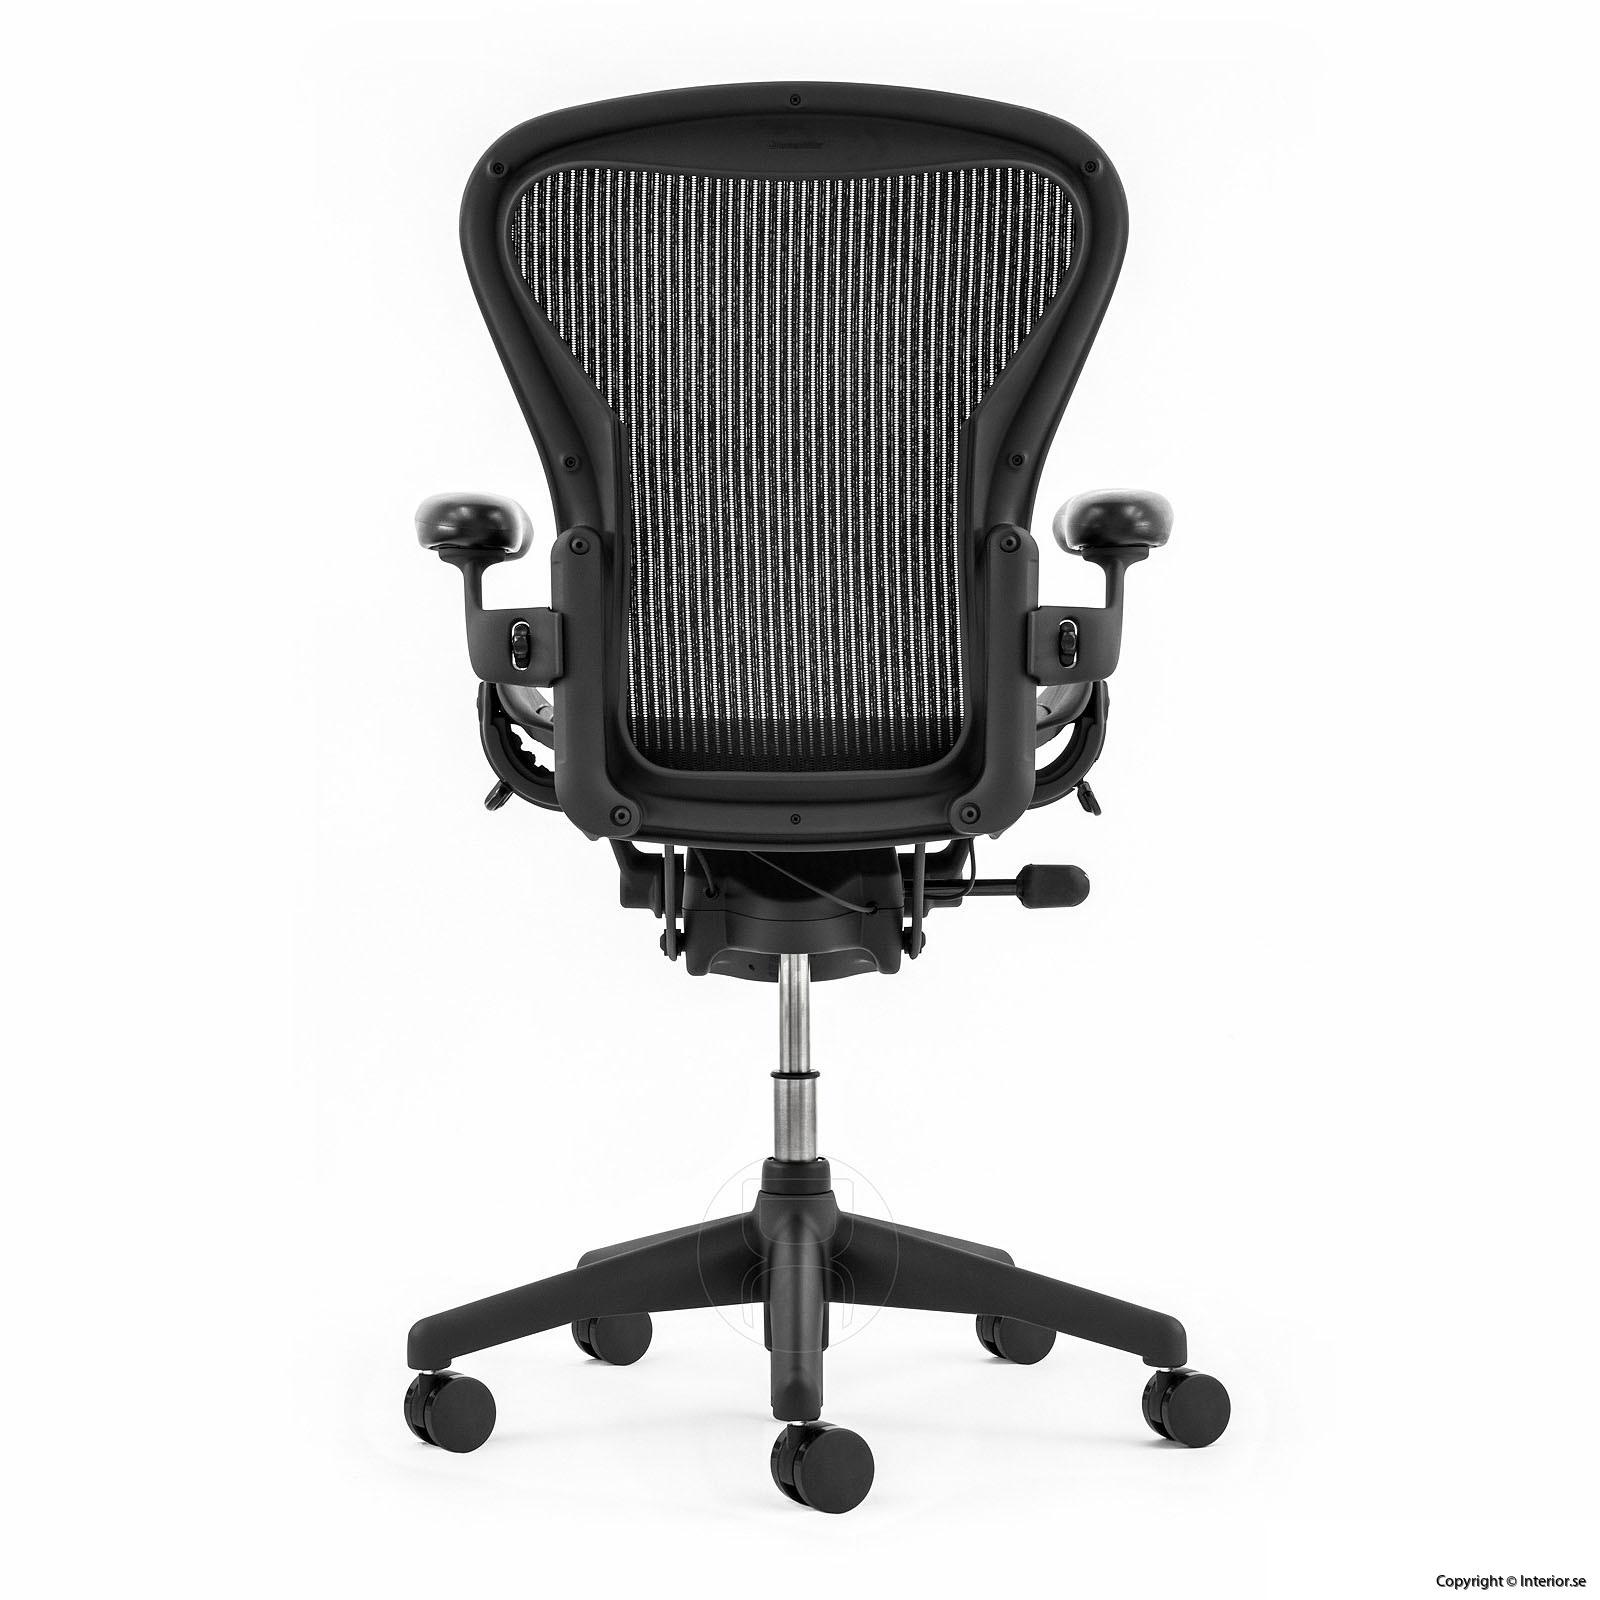 utan billig lumbar pad svankstöd herman miller aeron a small b medium c large refurbished sverige europe kontorsstol begagnad 4